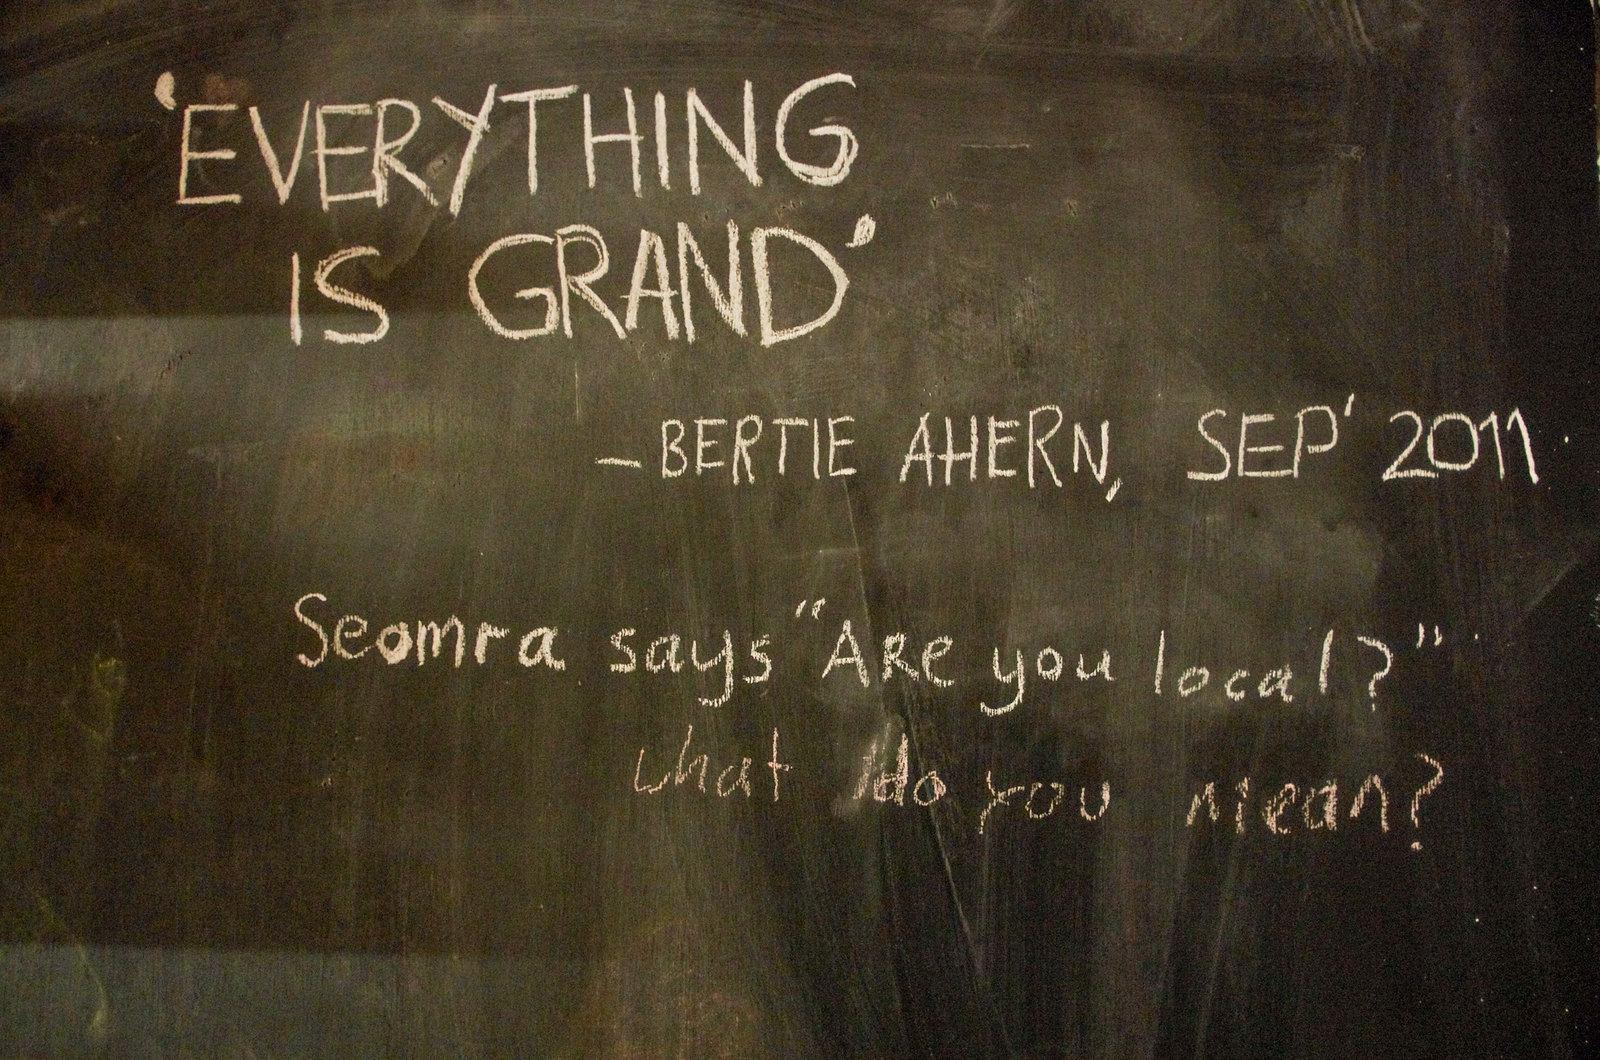 Dublin alternatif - Seomra Spraoi -Everything is grand